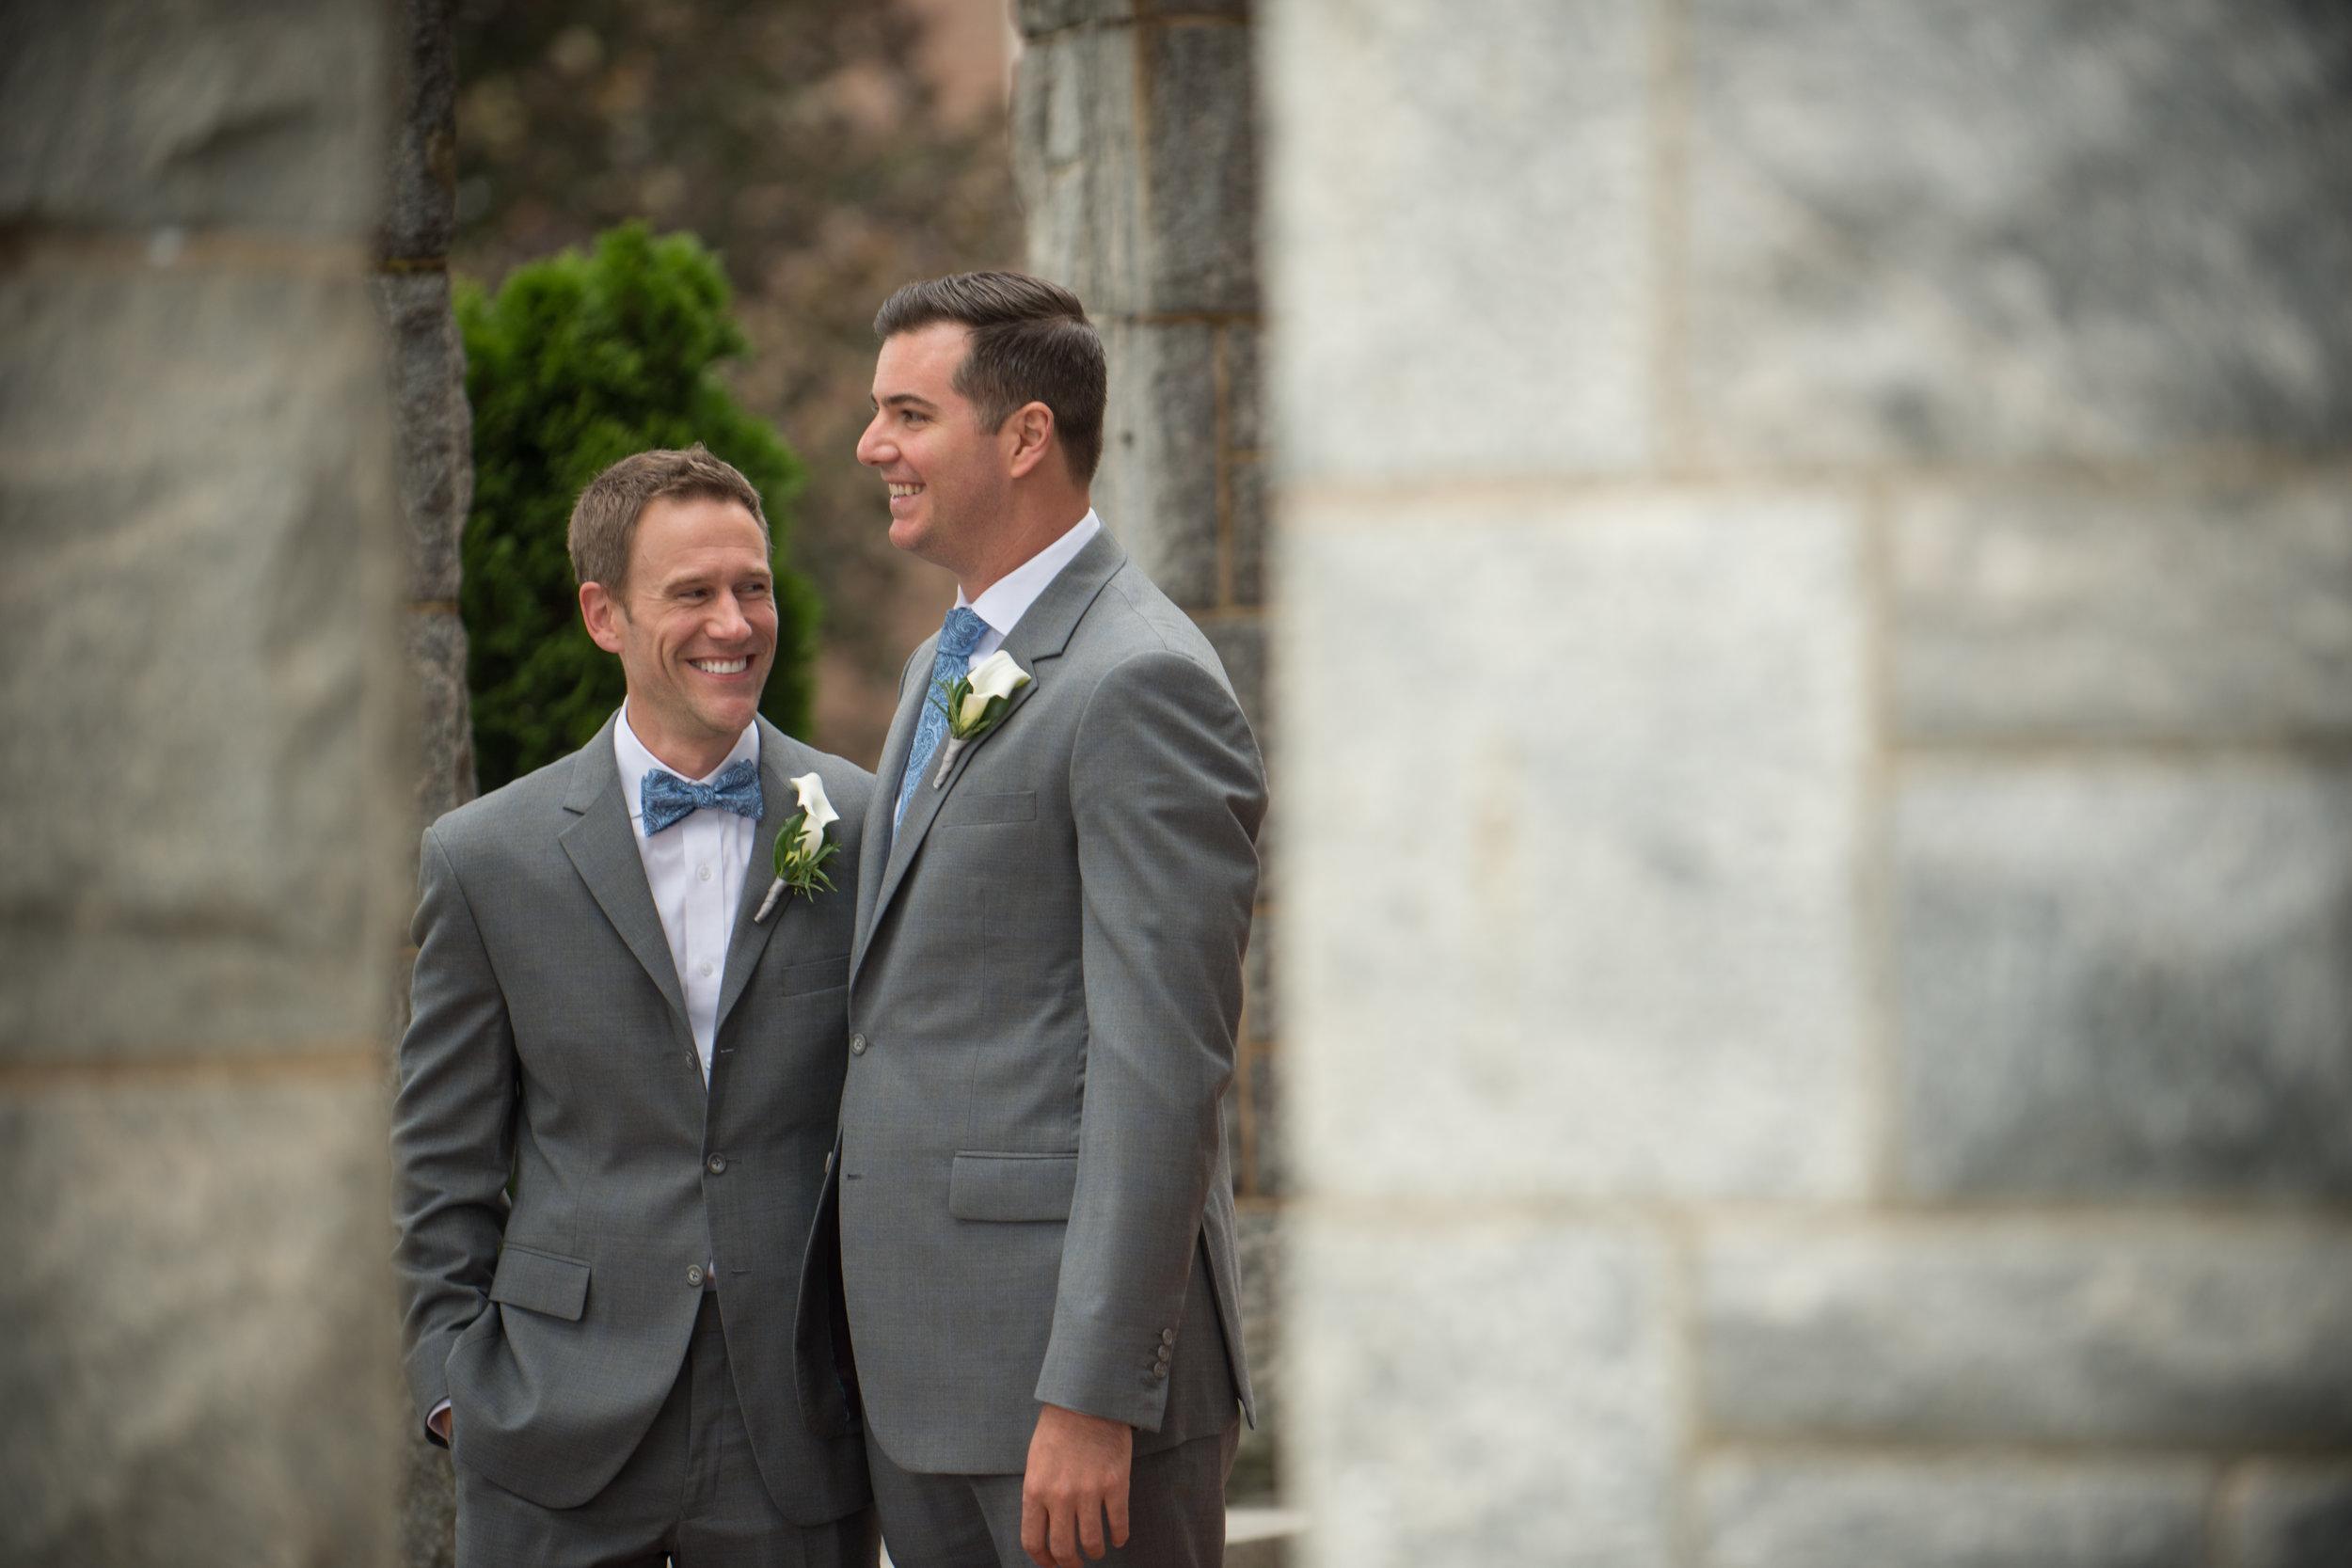 Same Sex Wedding Philadelphia Wedding PLanner LGBT Wedding000.jpg